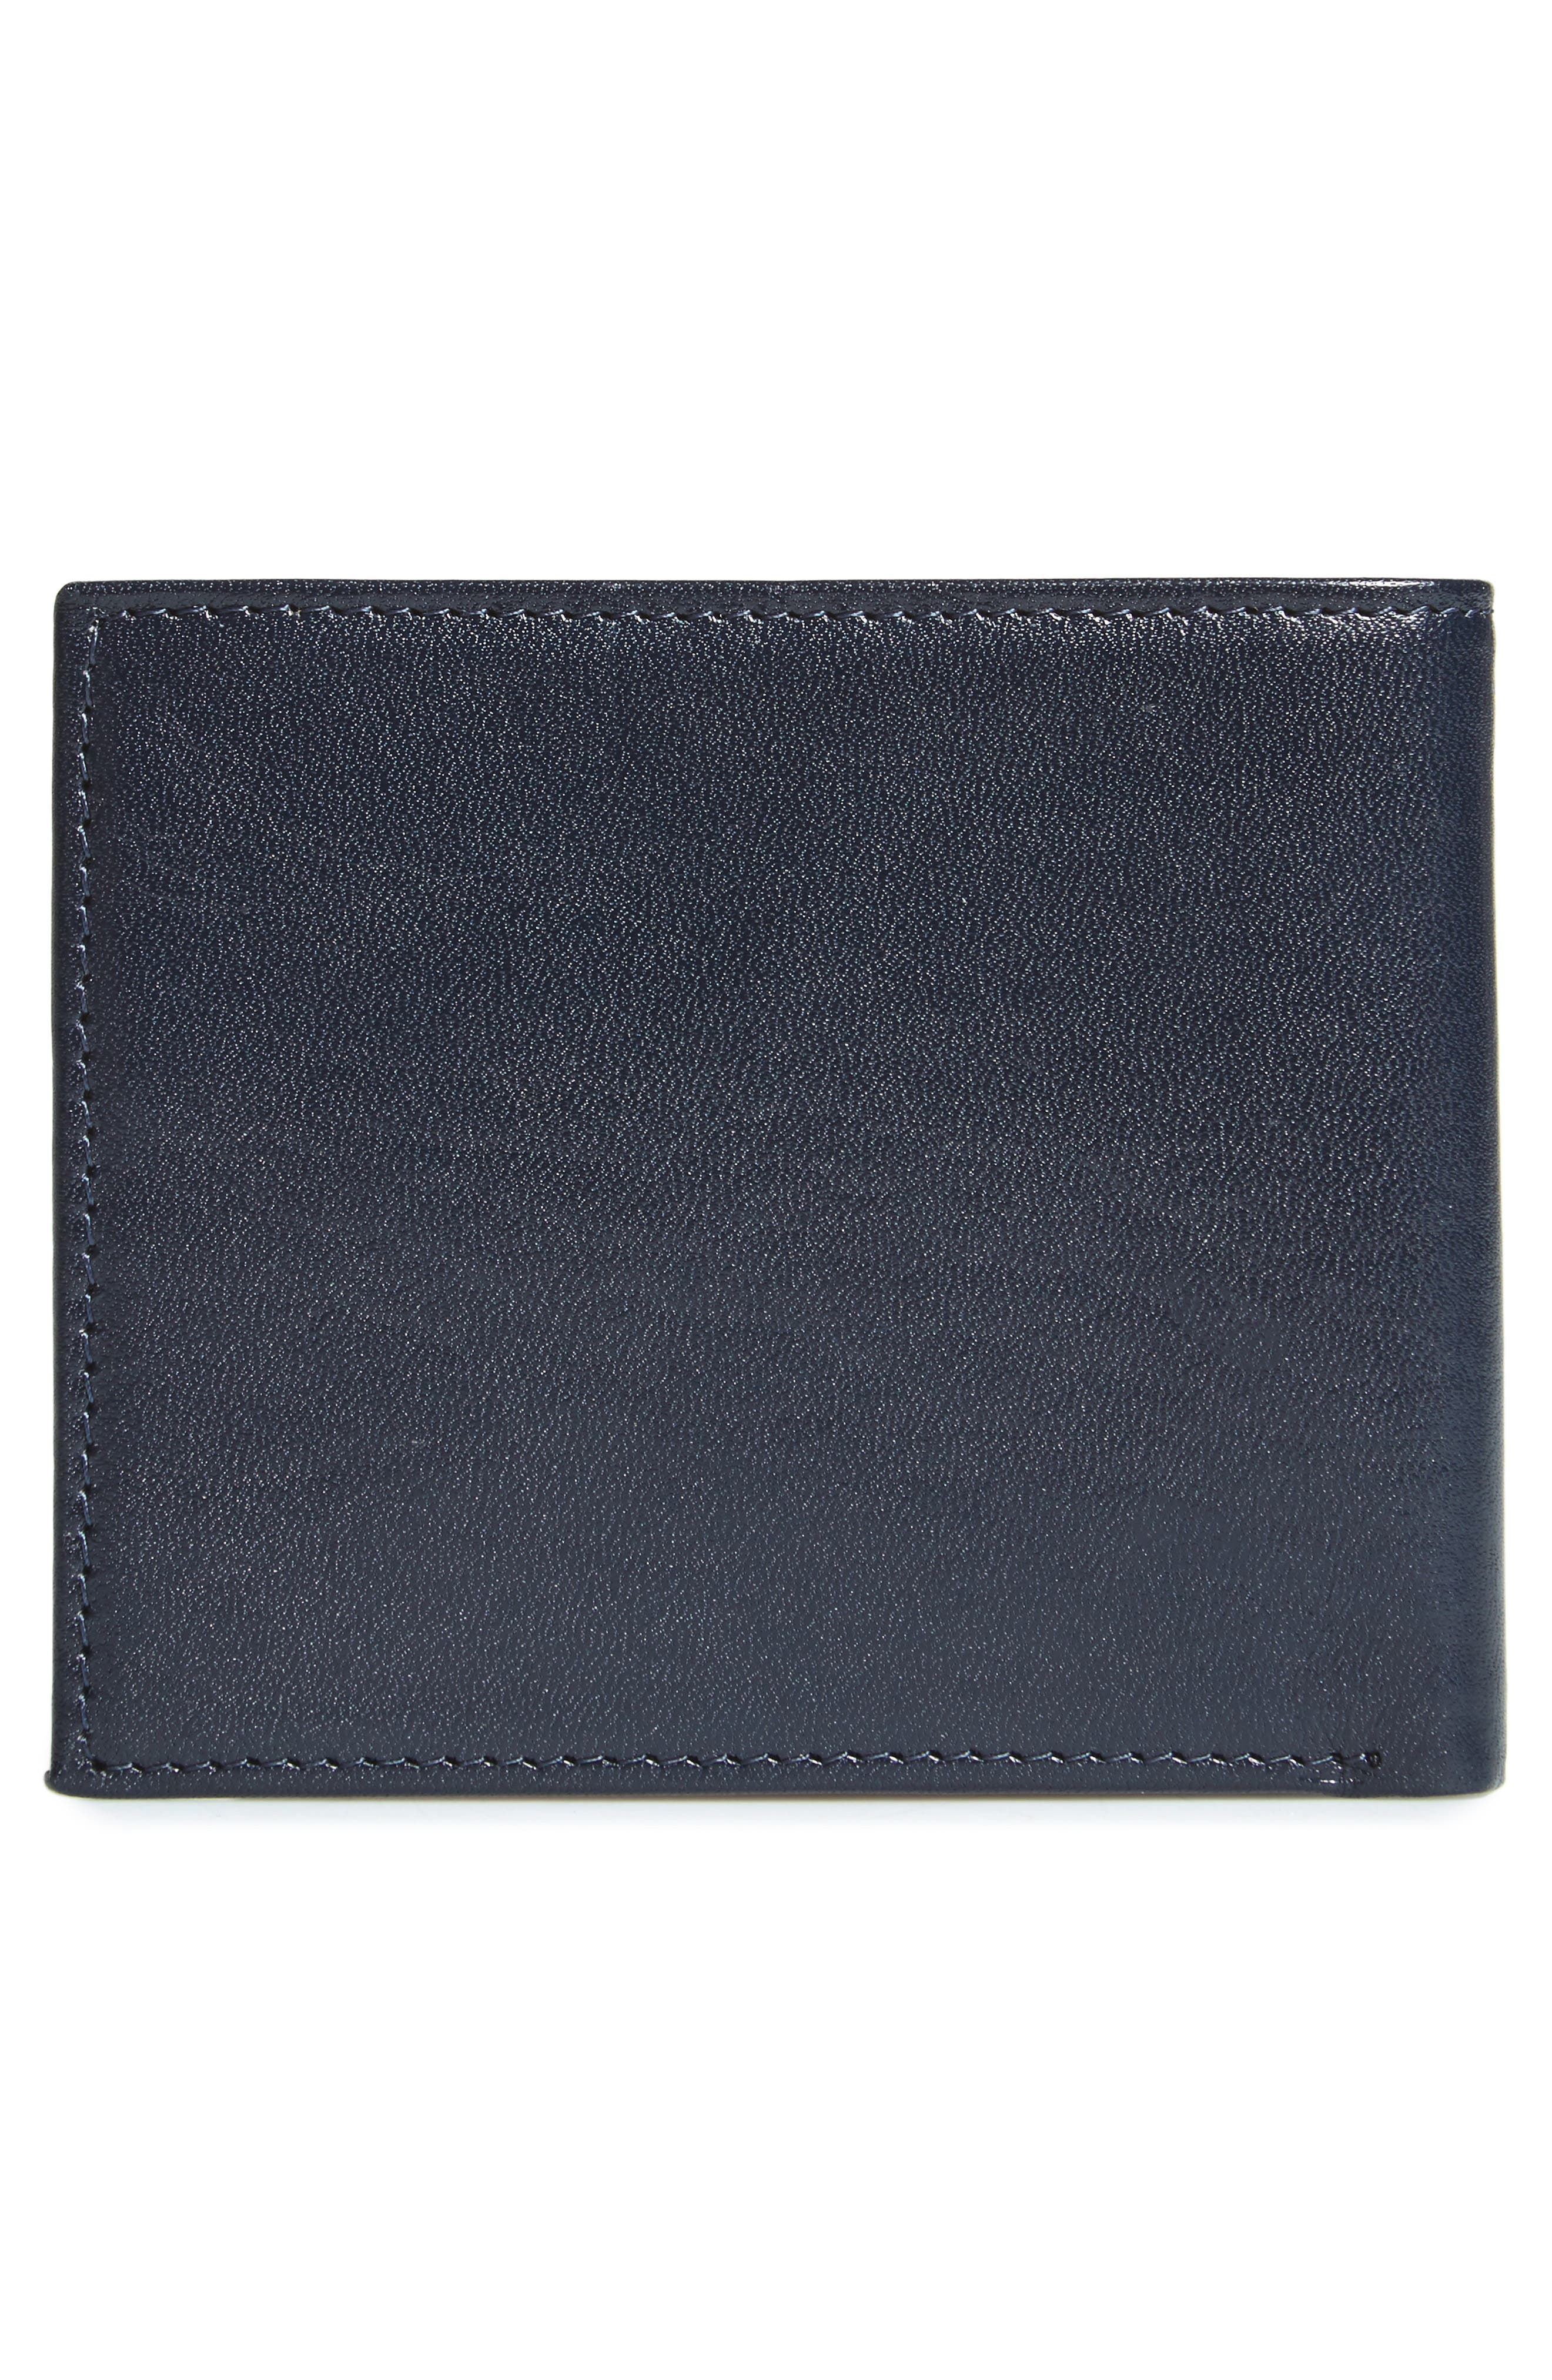 Alternate Image 3  - Ted Baker London Vivid Leather Wallet